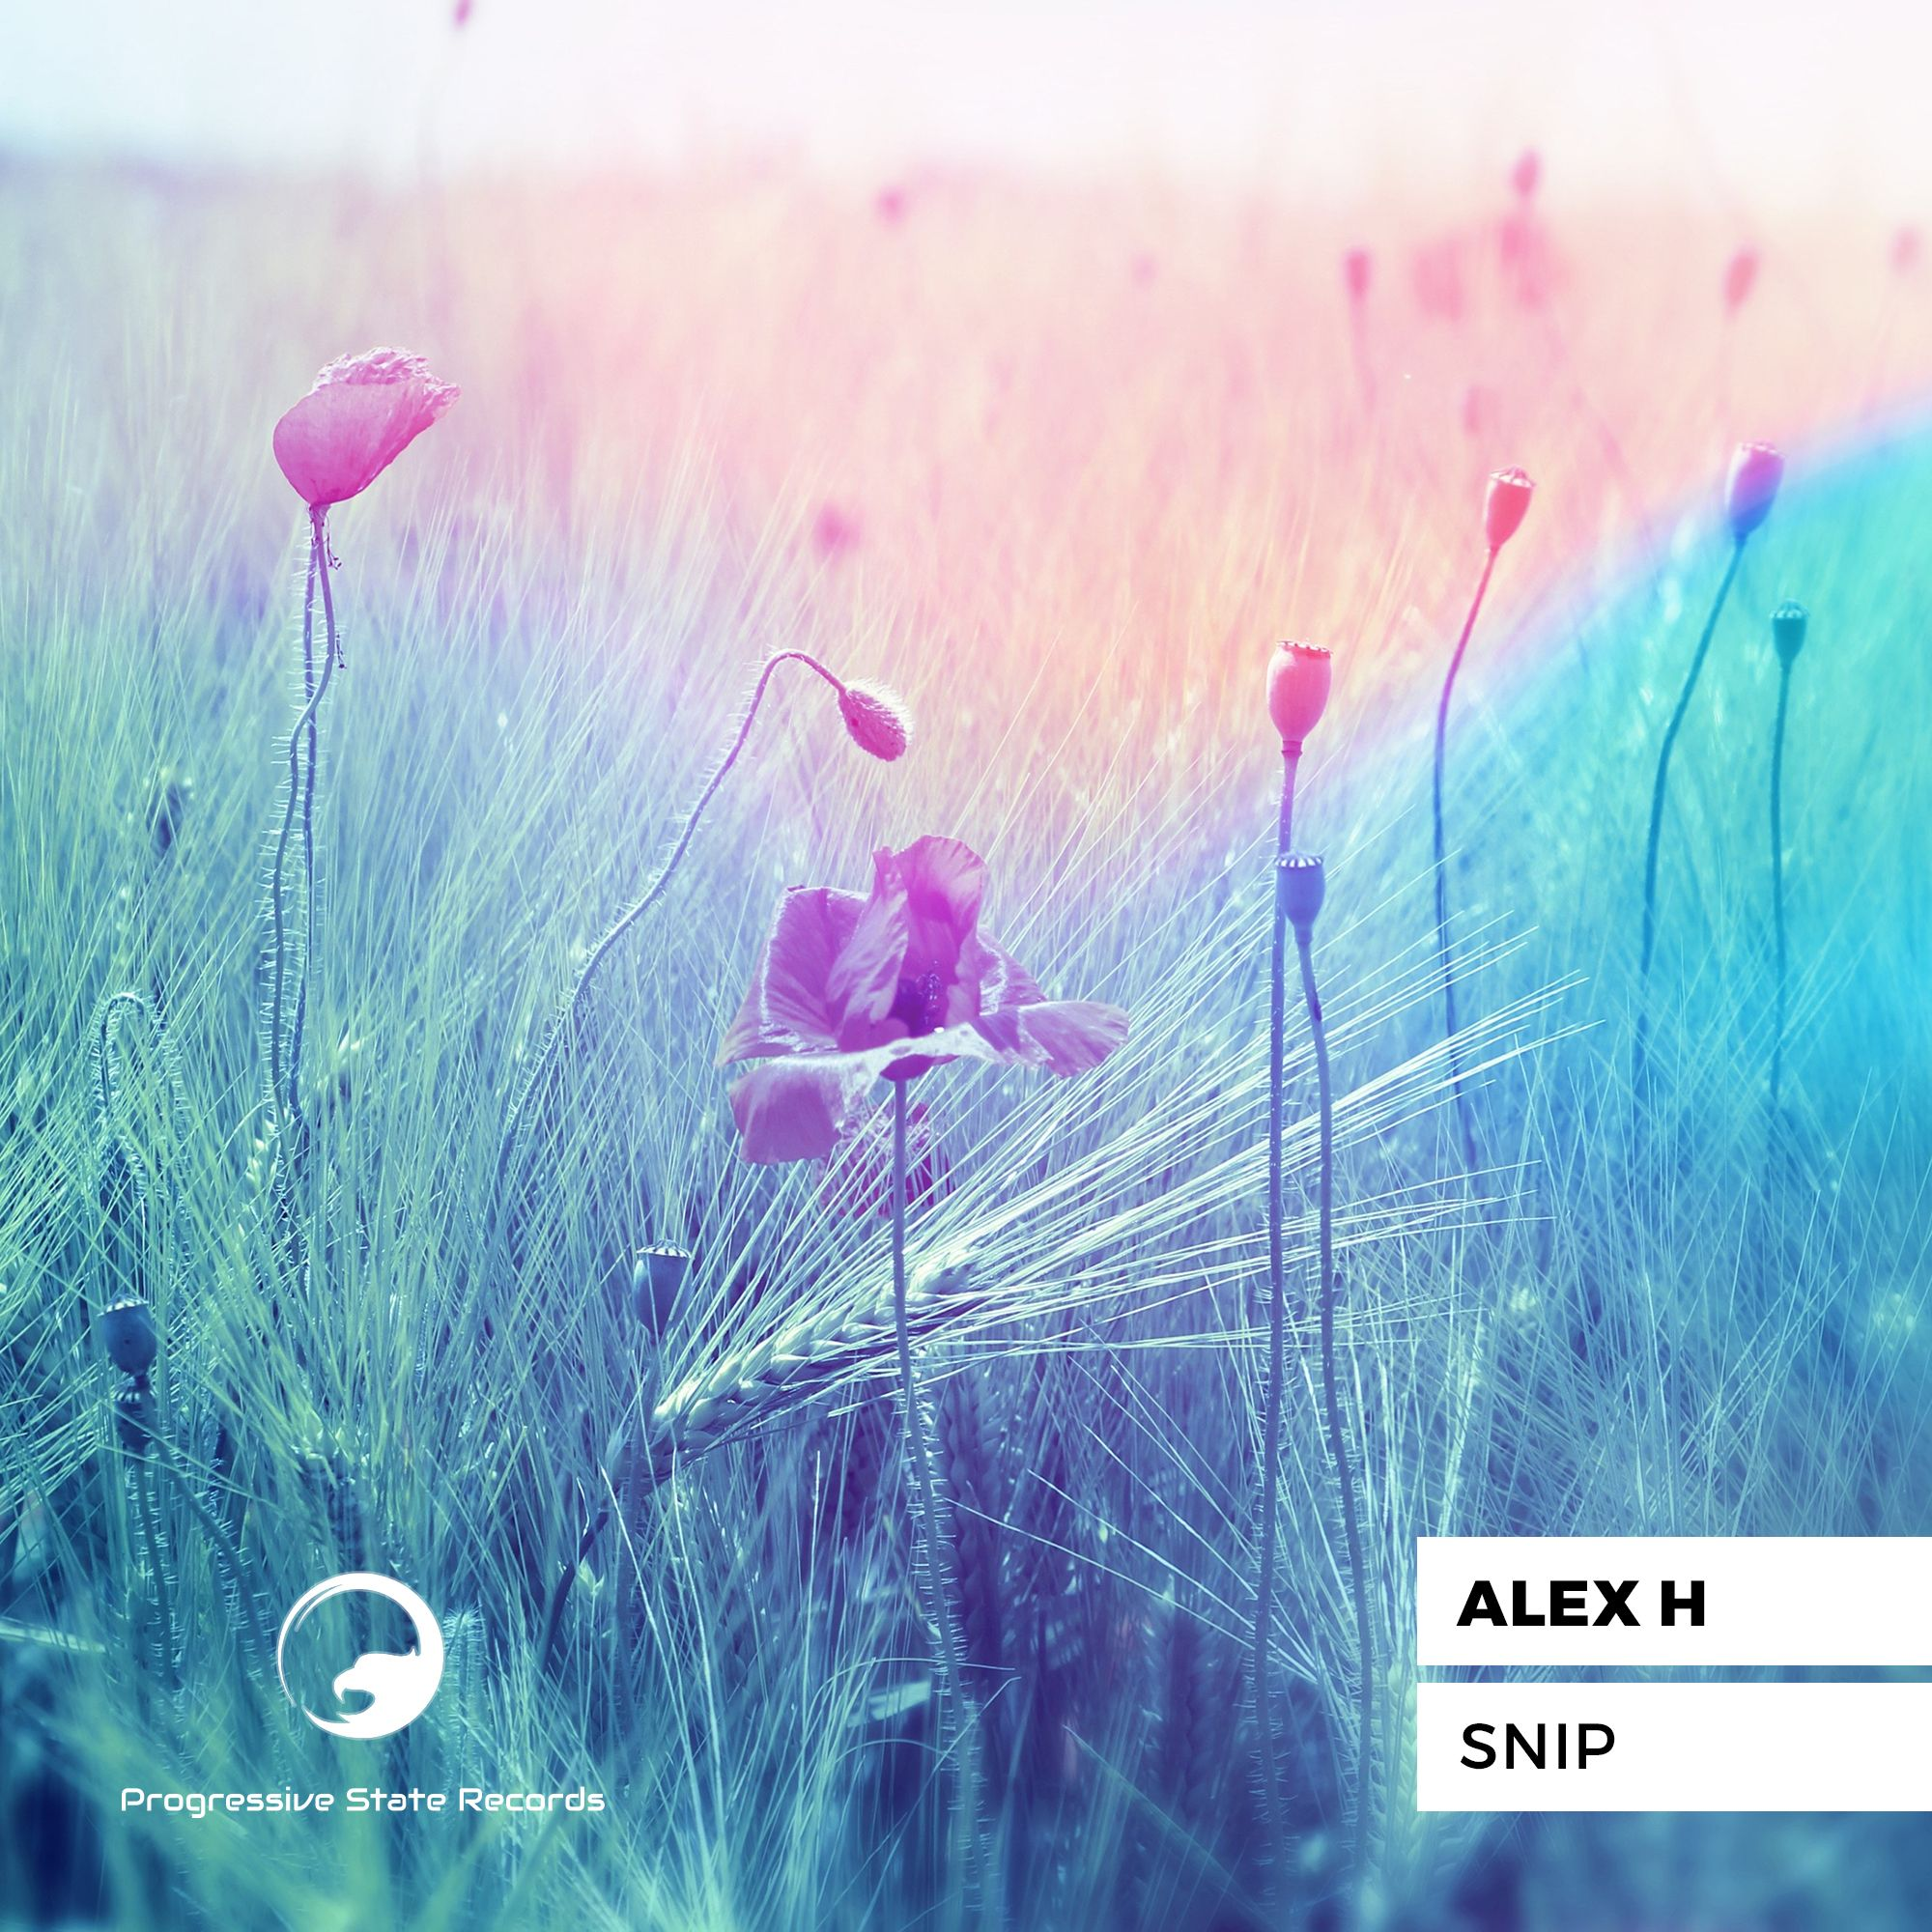 alex_h_-_snip_progressive_state_records.jpg